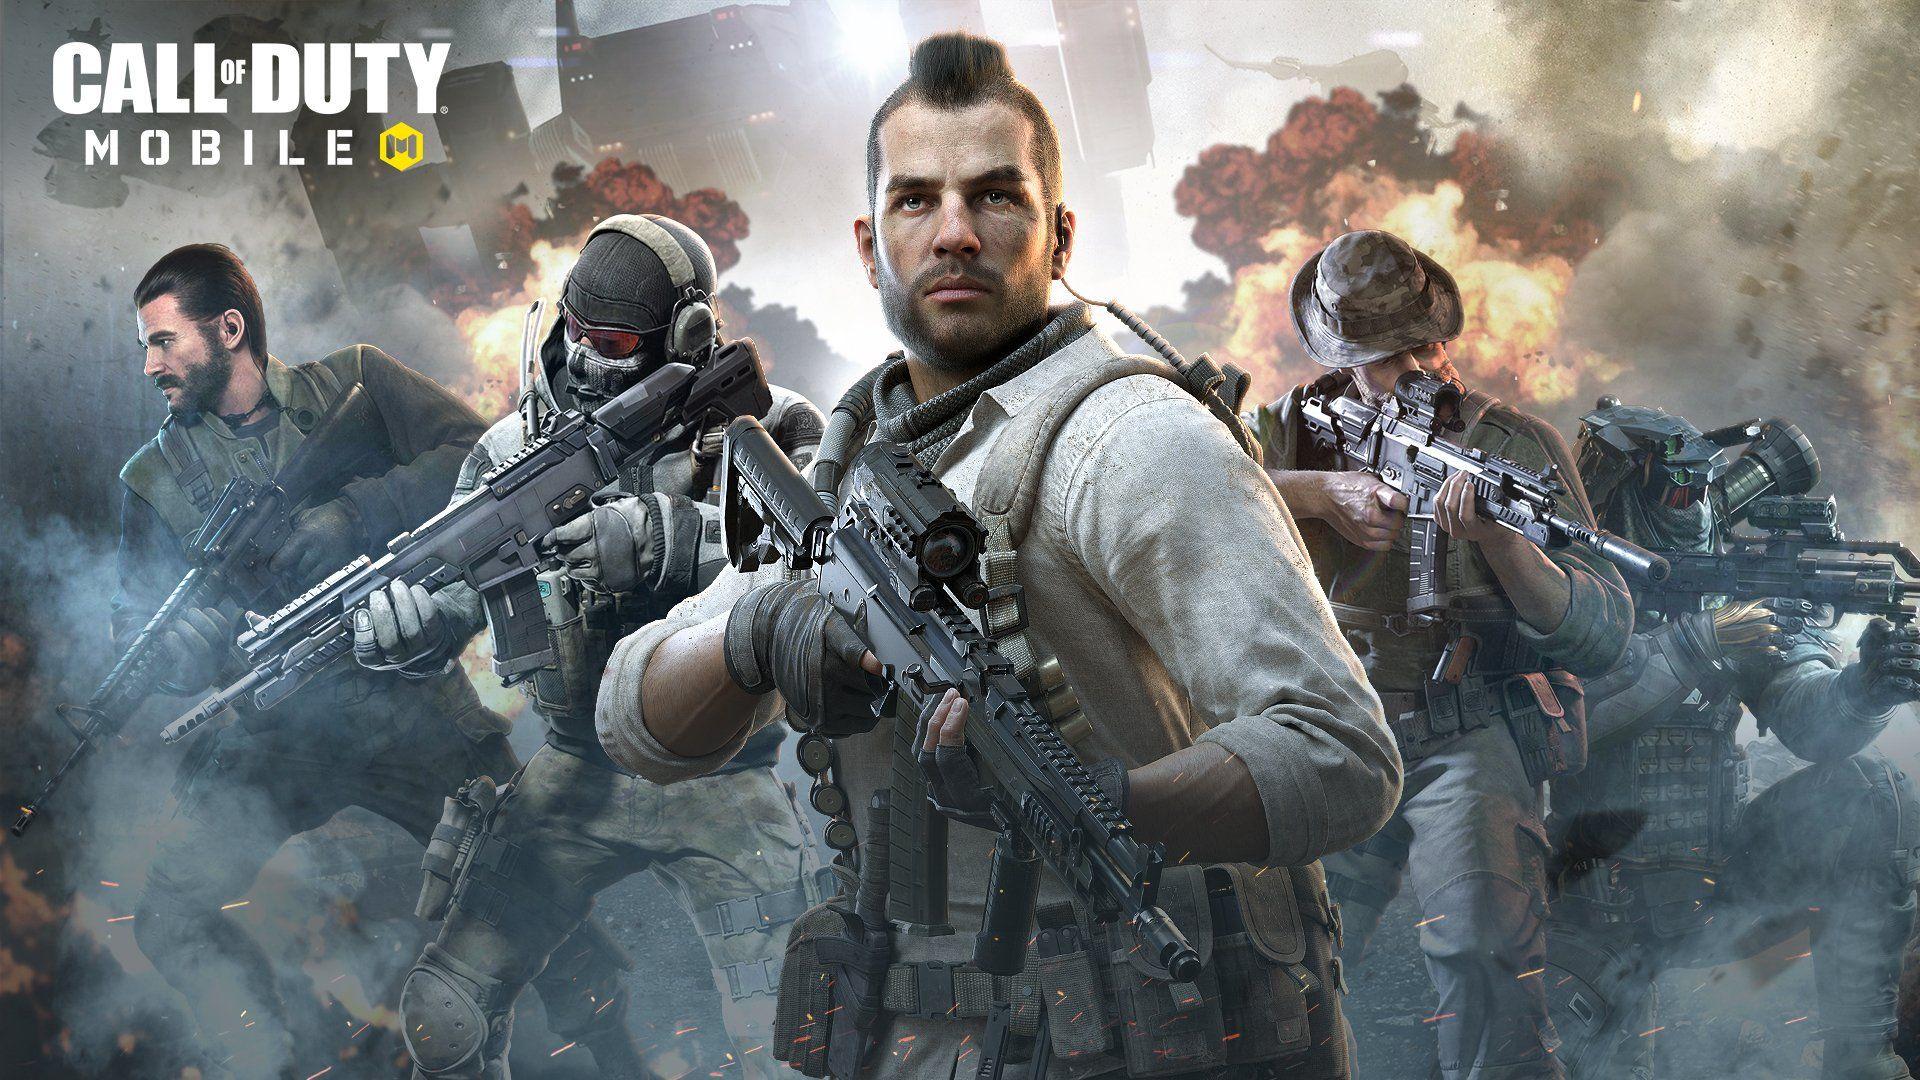 Pin De Daniel Montalvo En Call Of Duty Mobile Call Of Duty The Calling